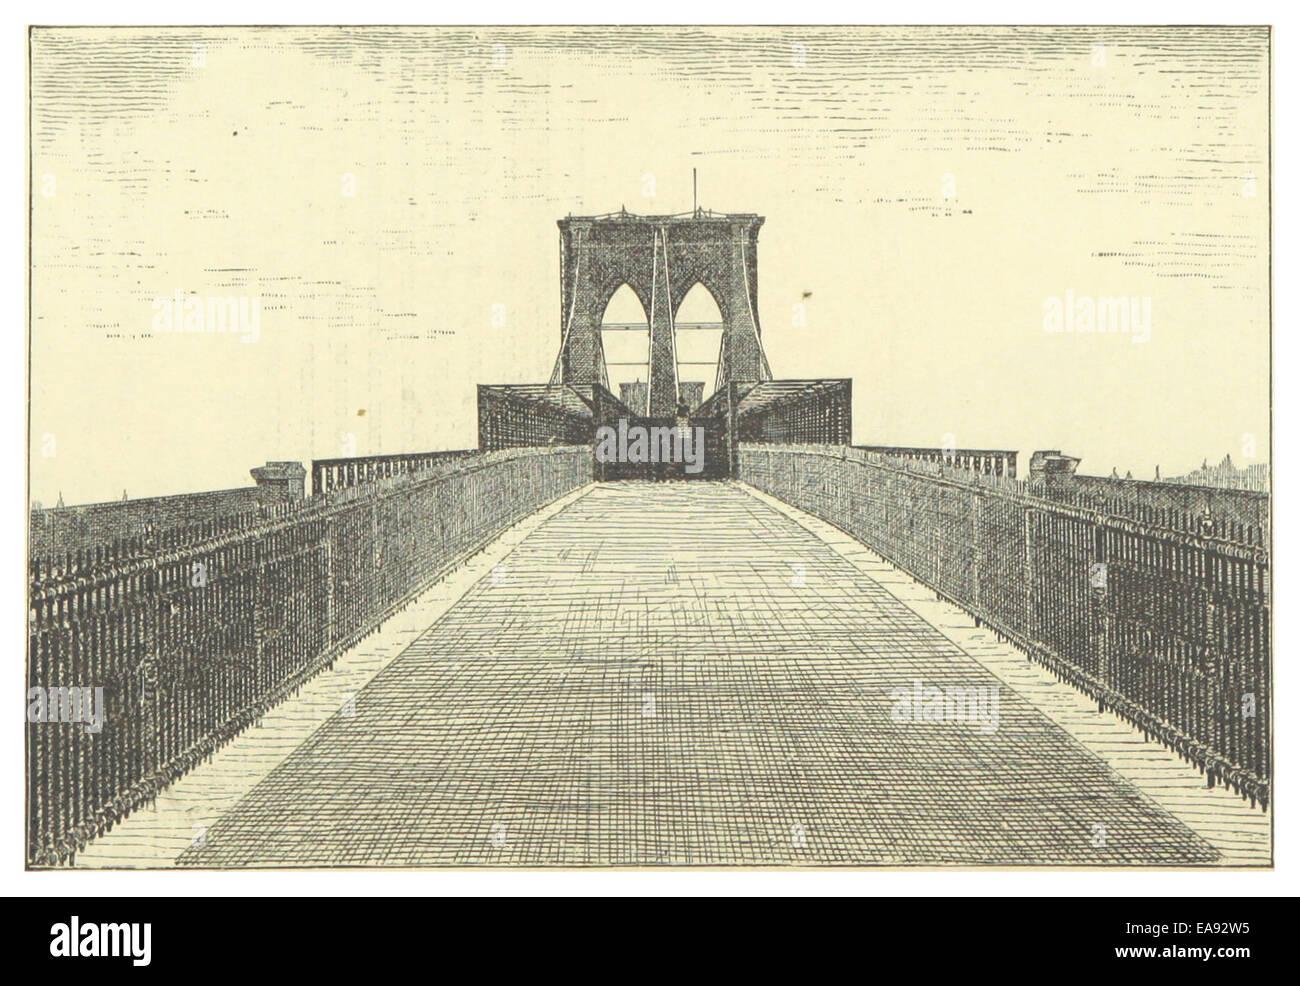 New York and Brooklyn Bridge (1883) - Plate 10 Stock Photo